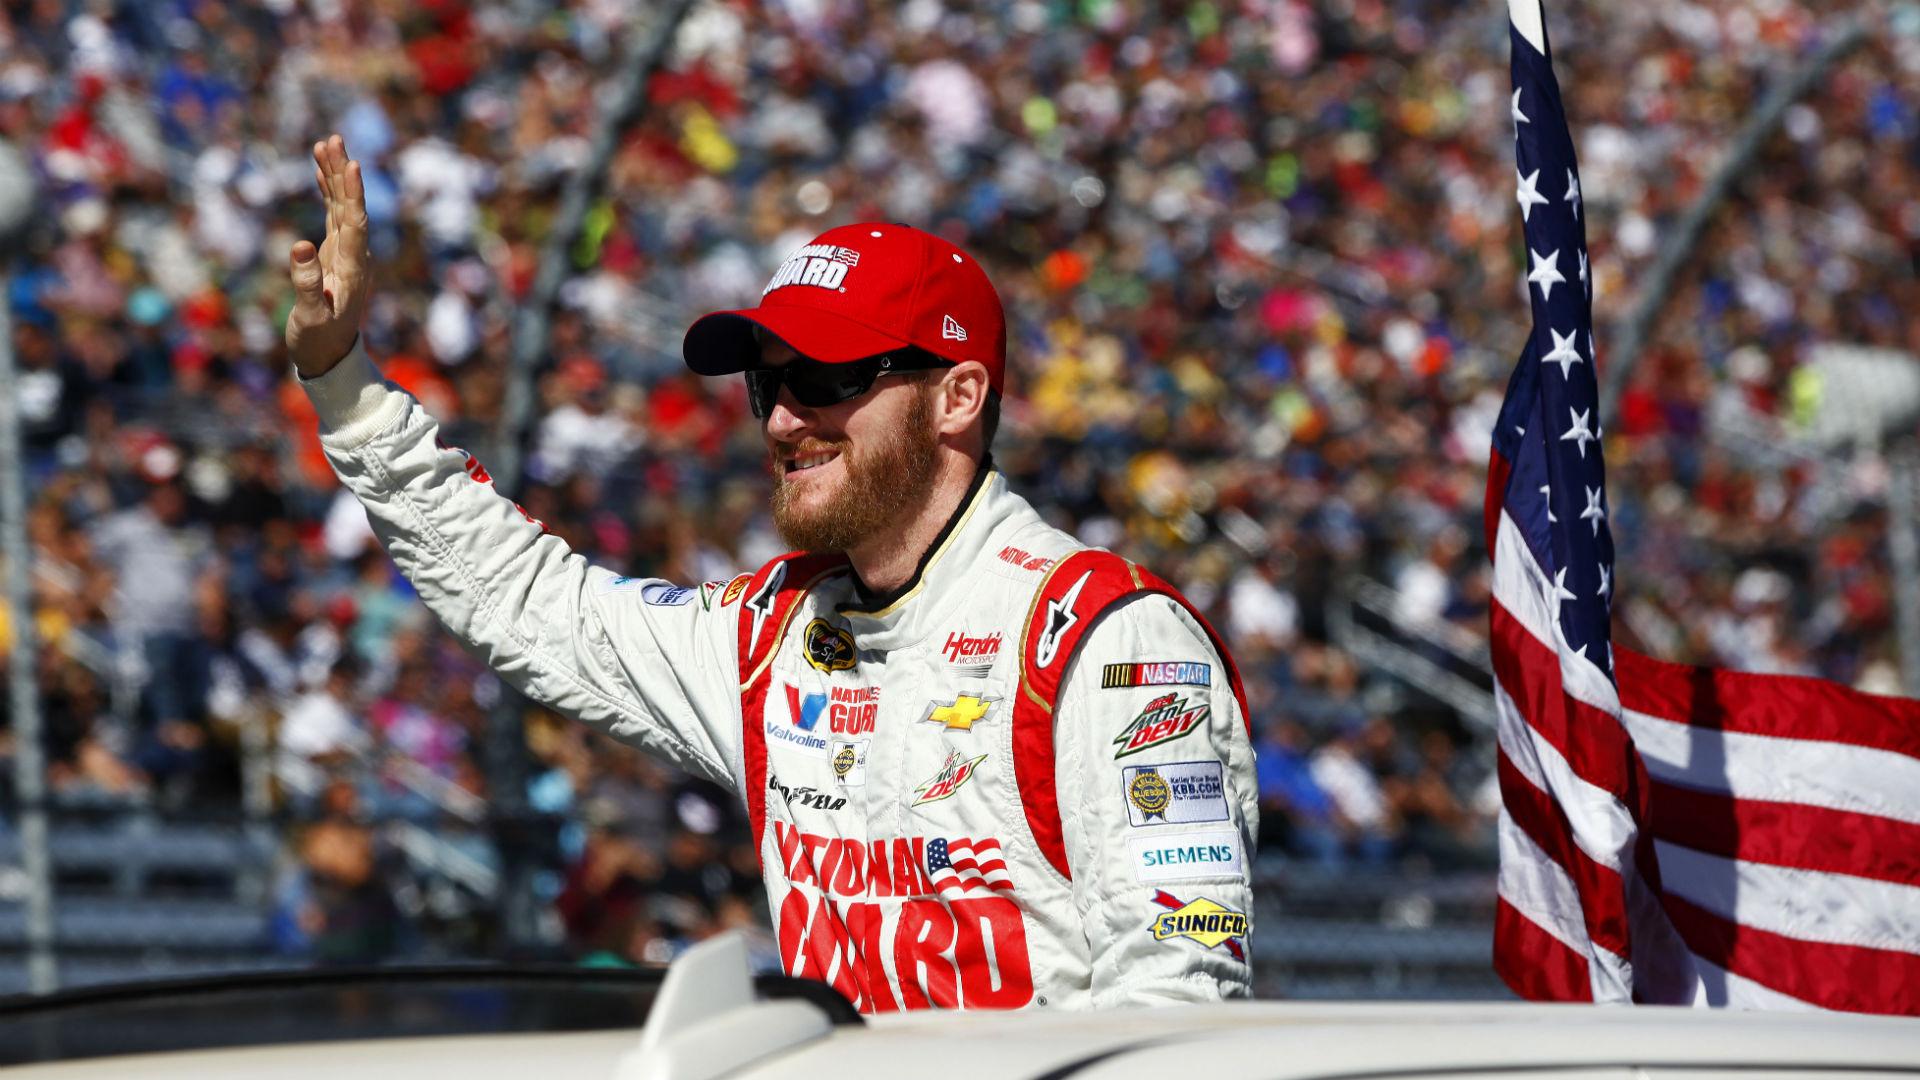 Sprint Unlimited odds – Dale Jr. shares co-favorite status